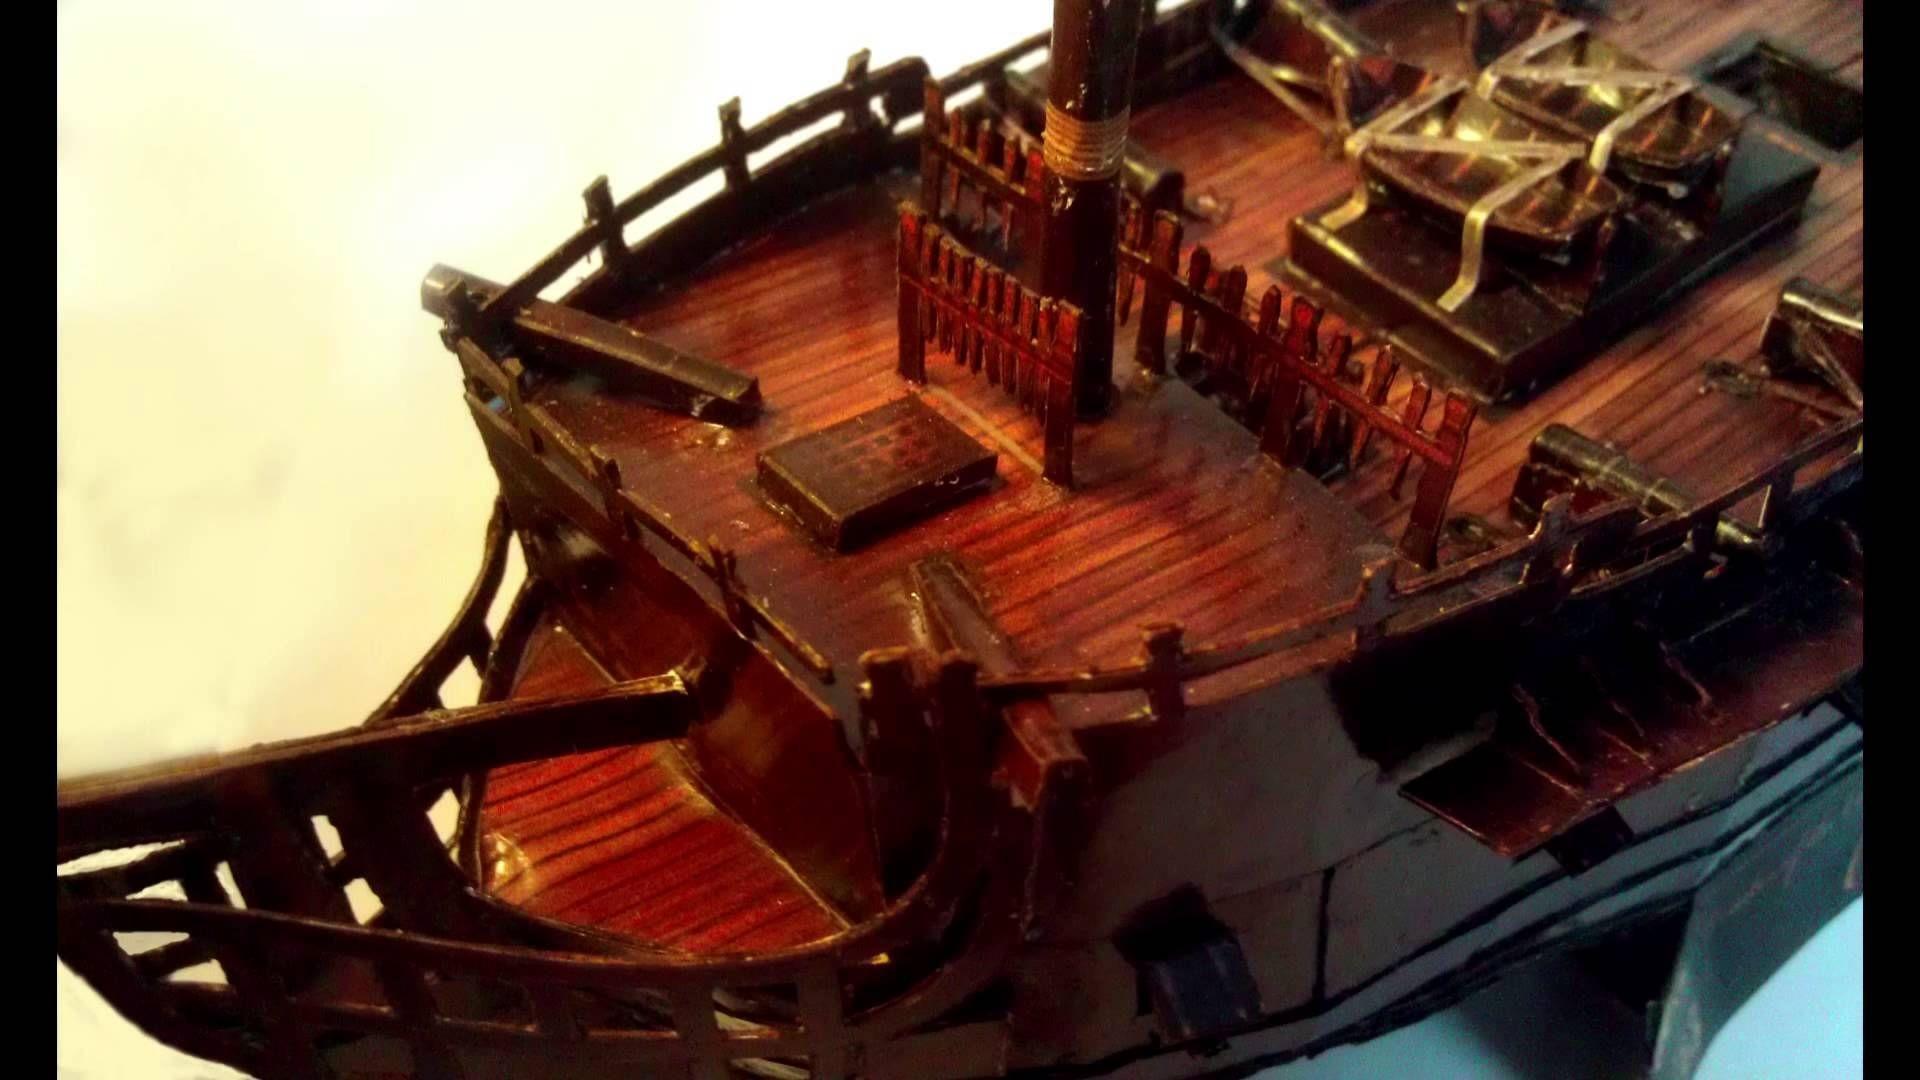 Ship Papercraft Картинки по запросу подеРка на тему пиратов карибского моря